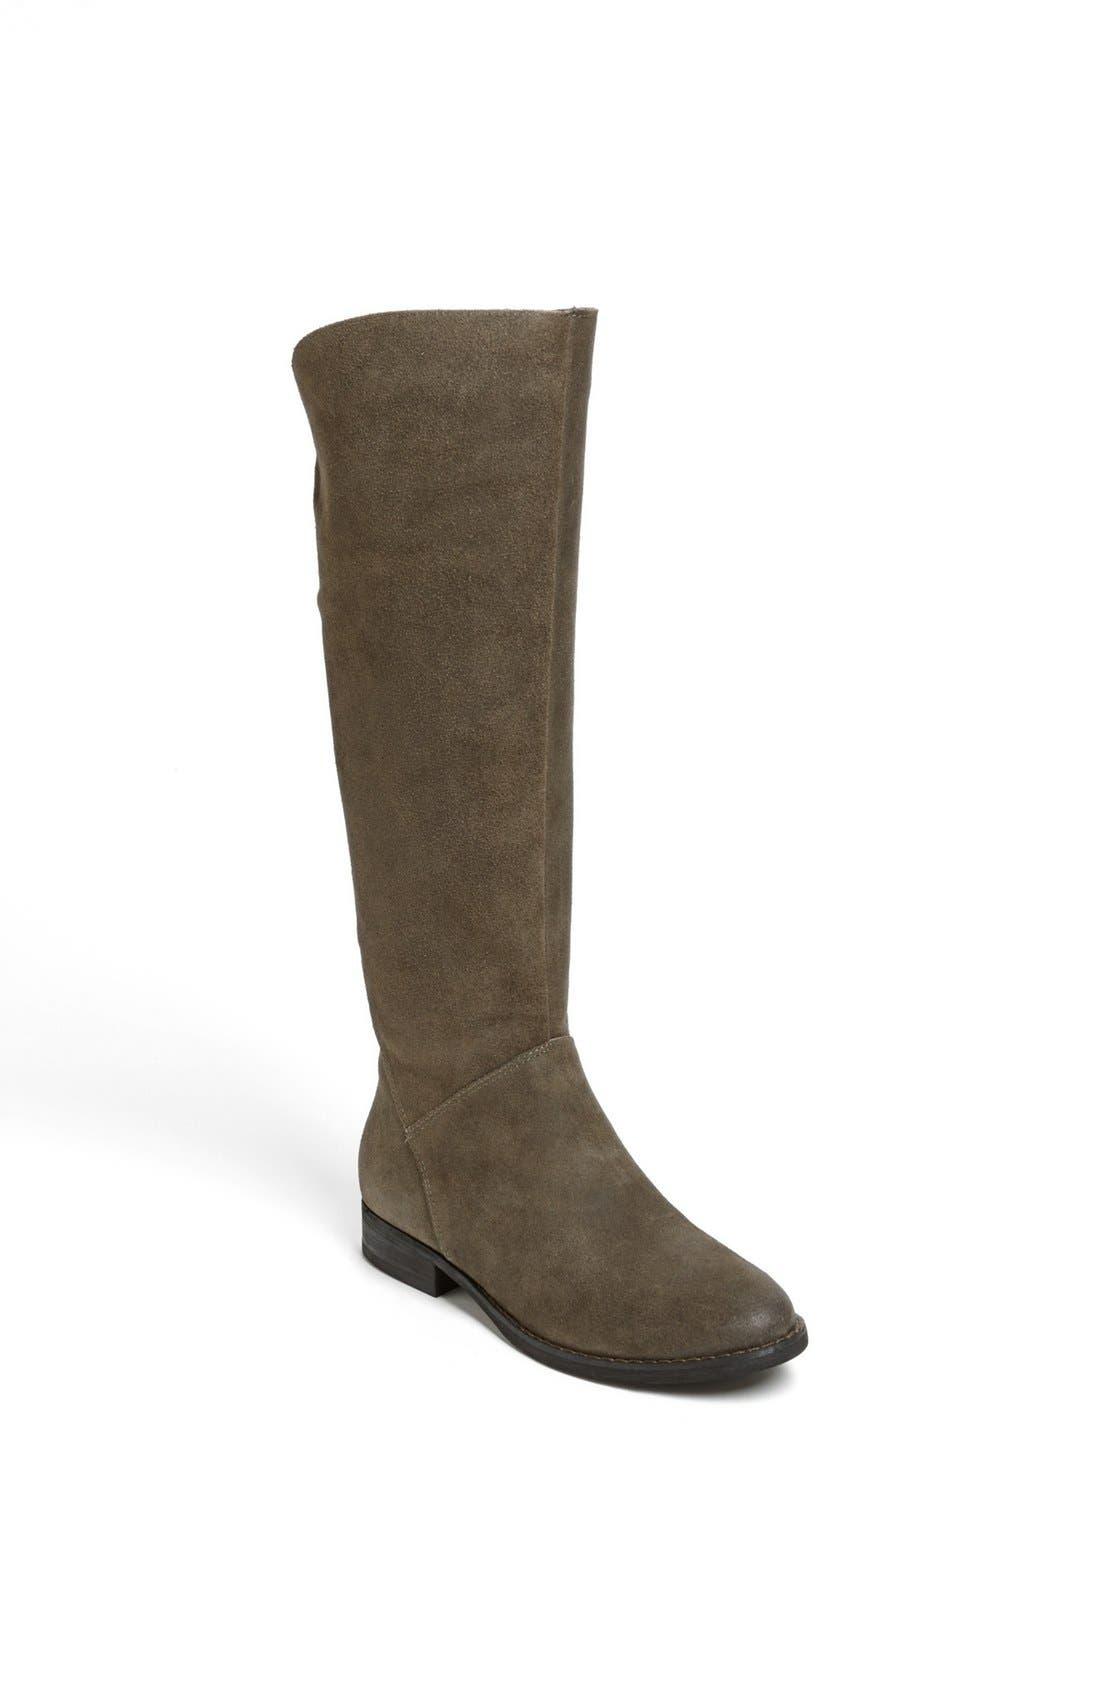 Alternate Image 1 Selected - Ivanka Trump 'Jenn' boot